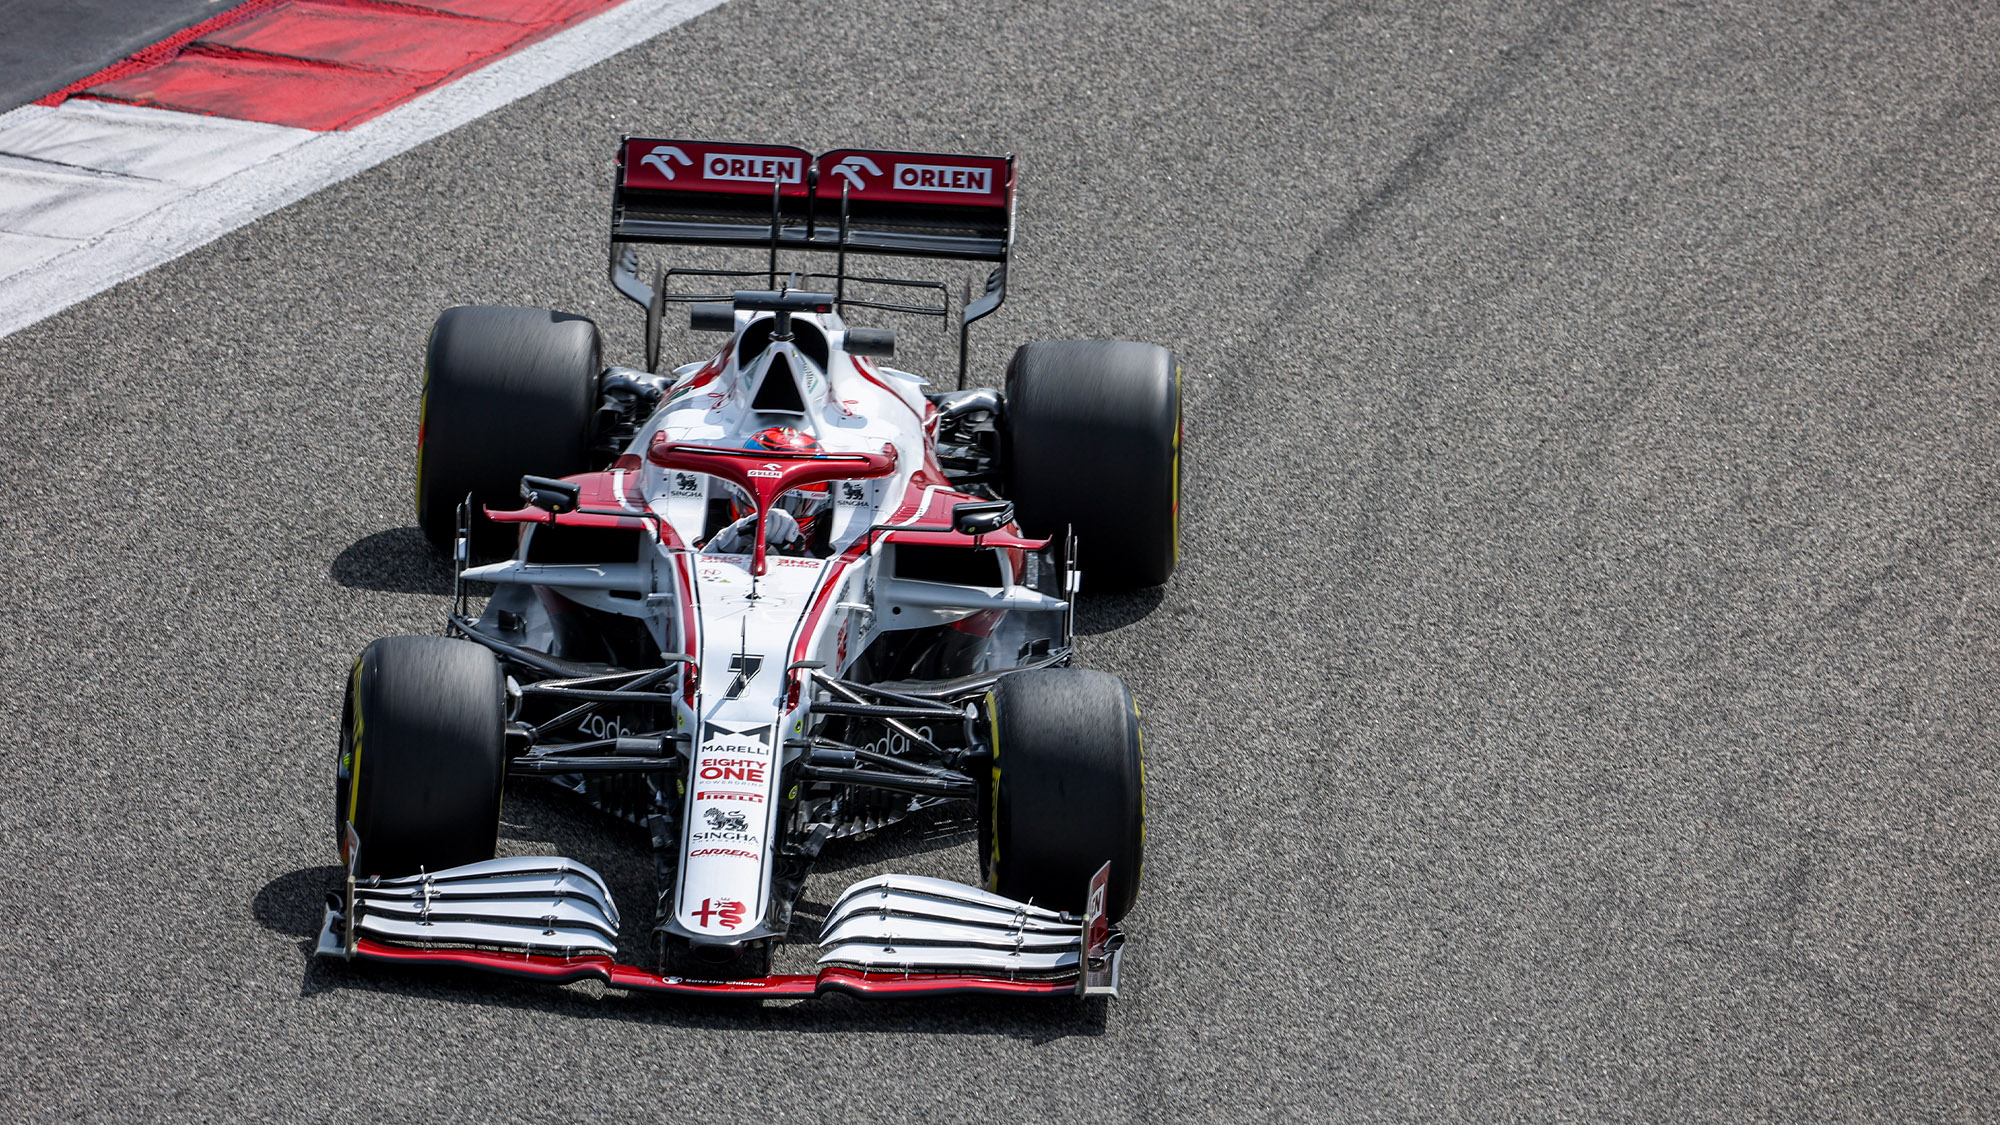 2021 Alfa Romeo preseason testing